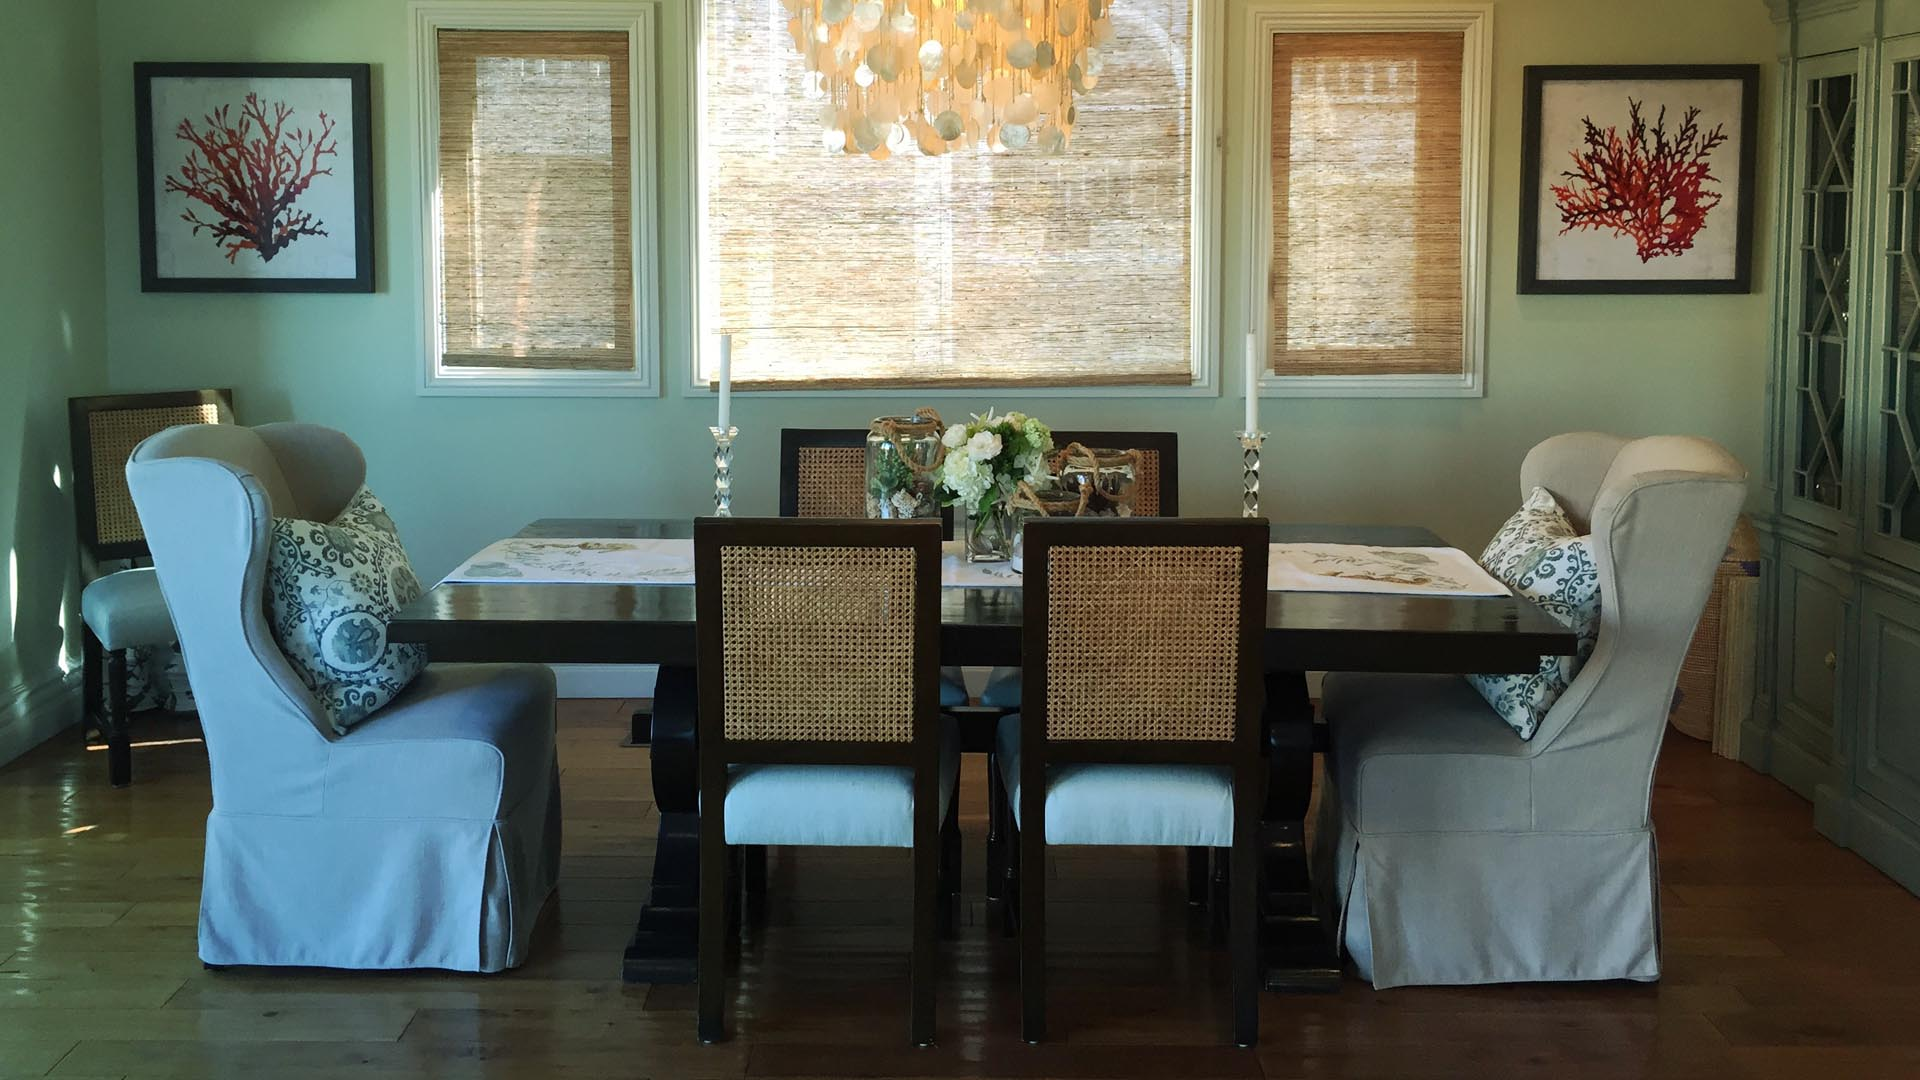 The South Bay Interior Designers